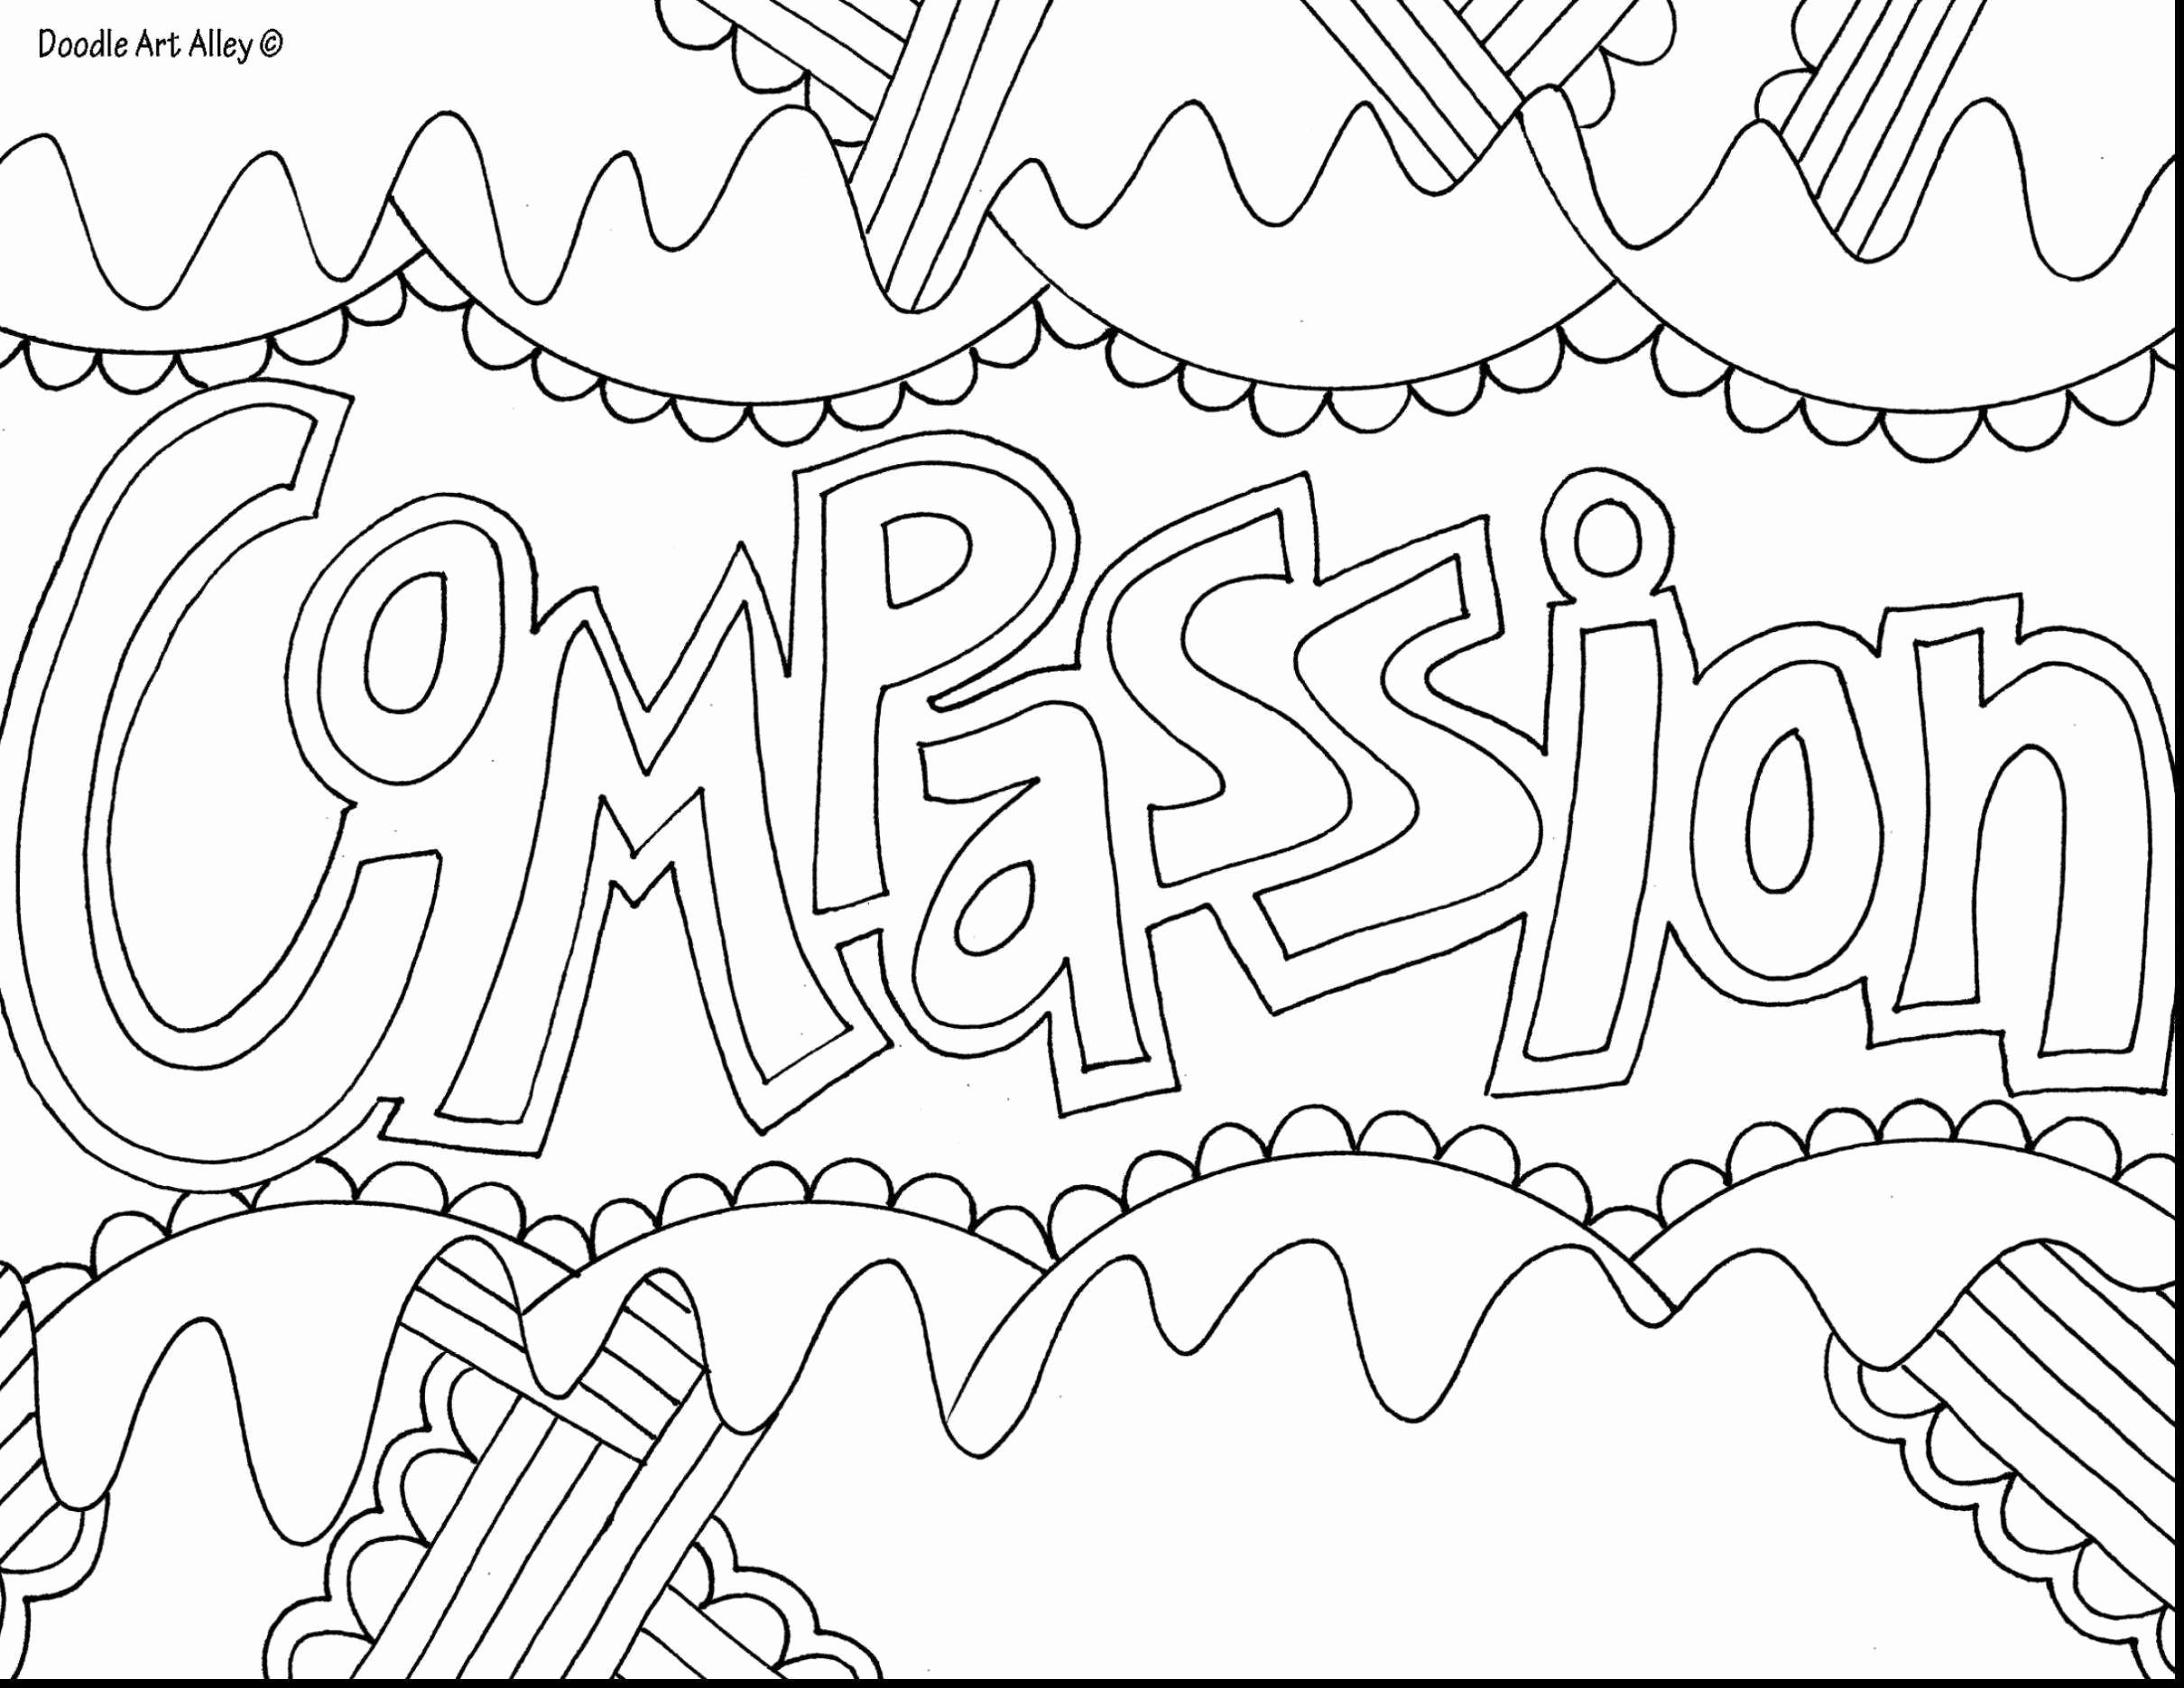 Cool Design Coloring Pages For Boys  34 Unique Image Printable Mandala Designs